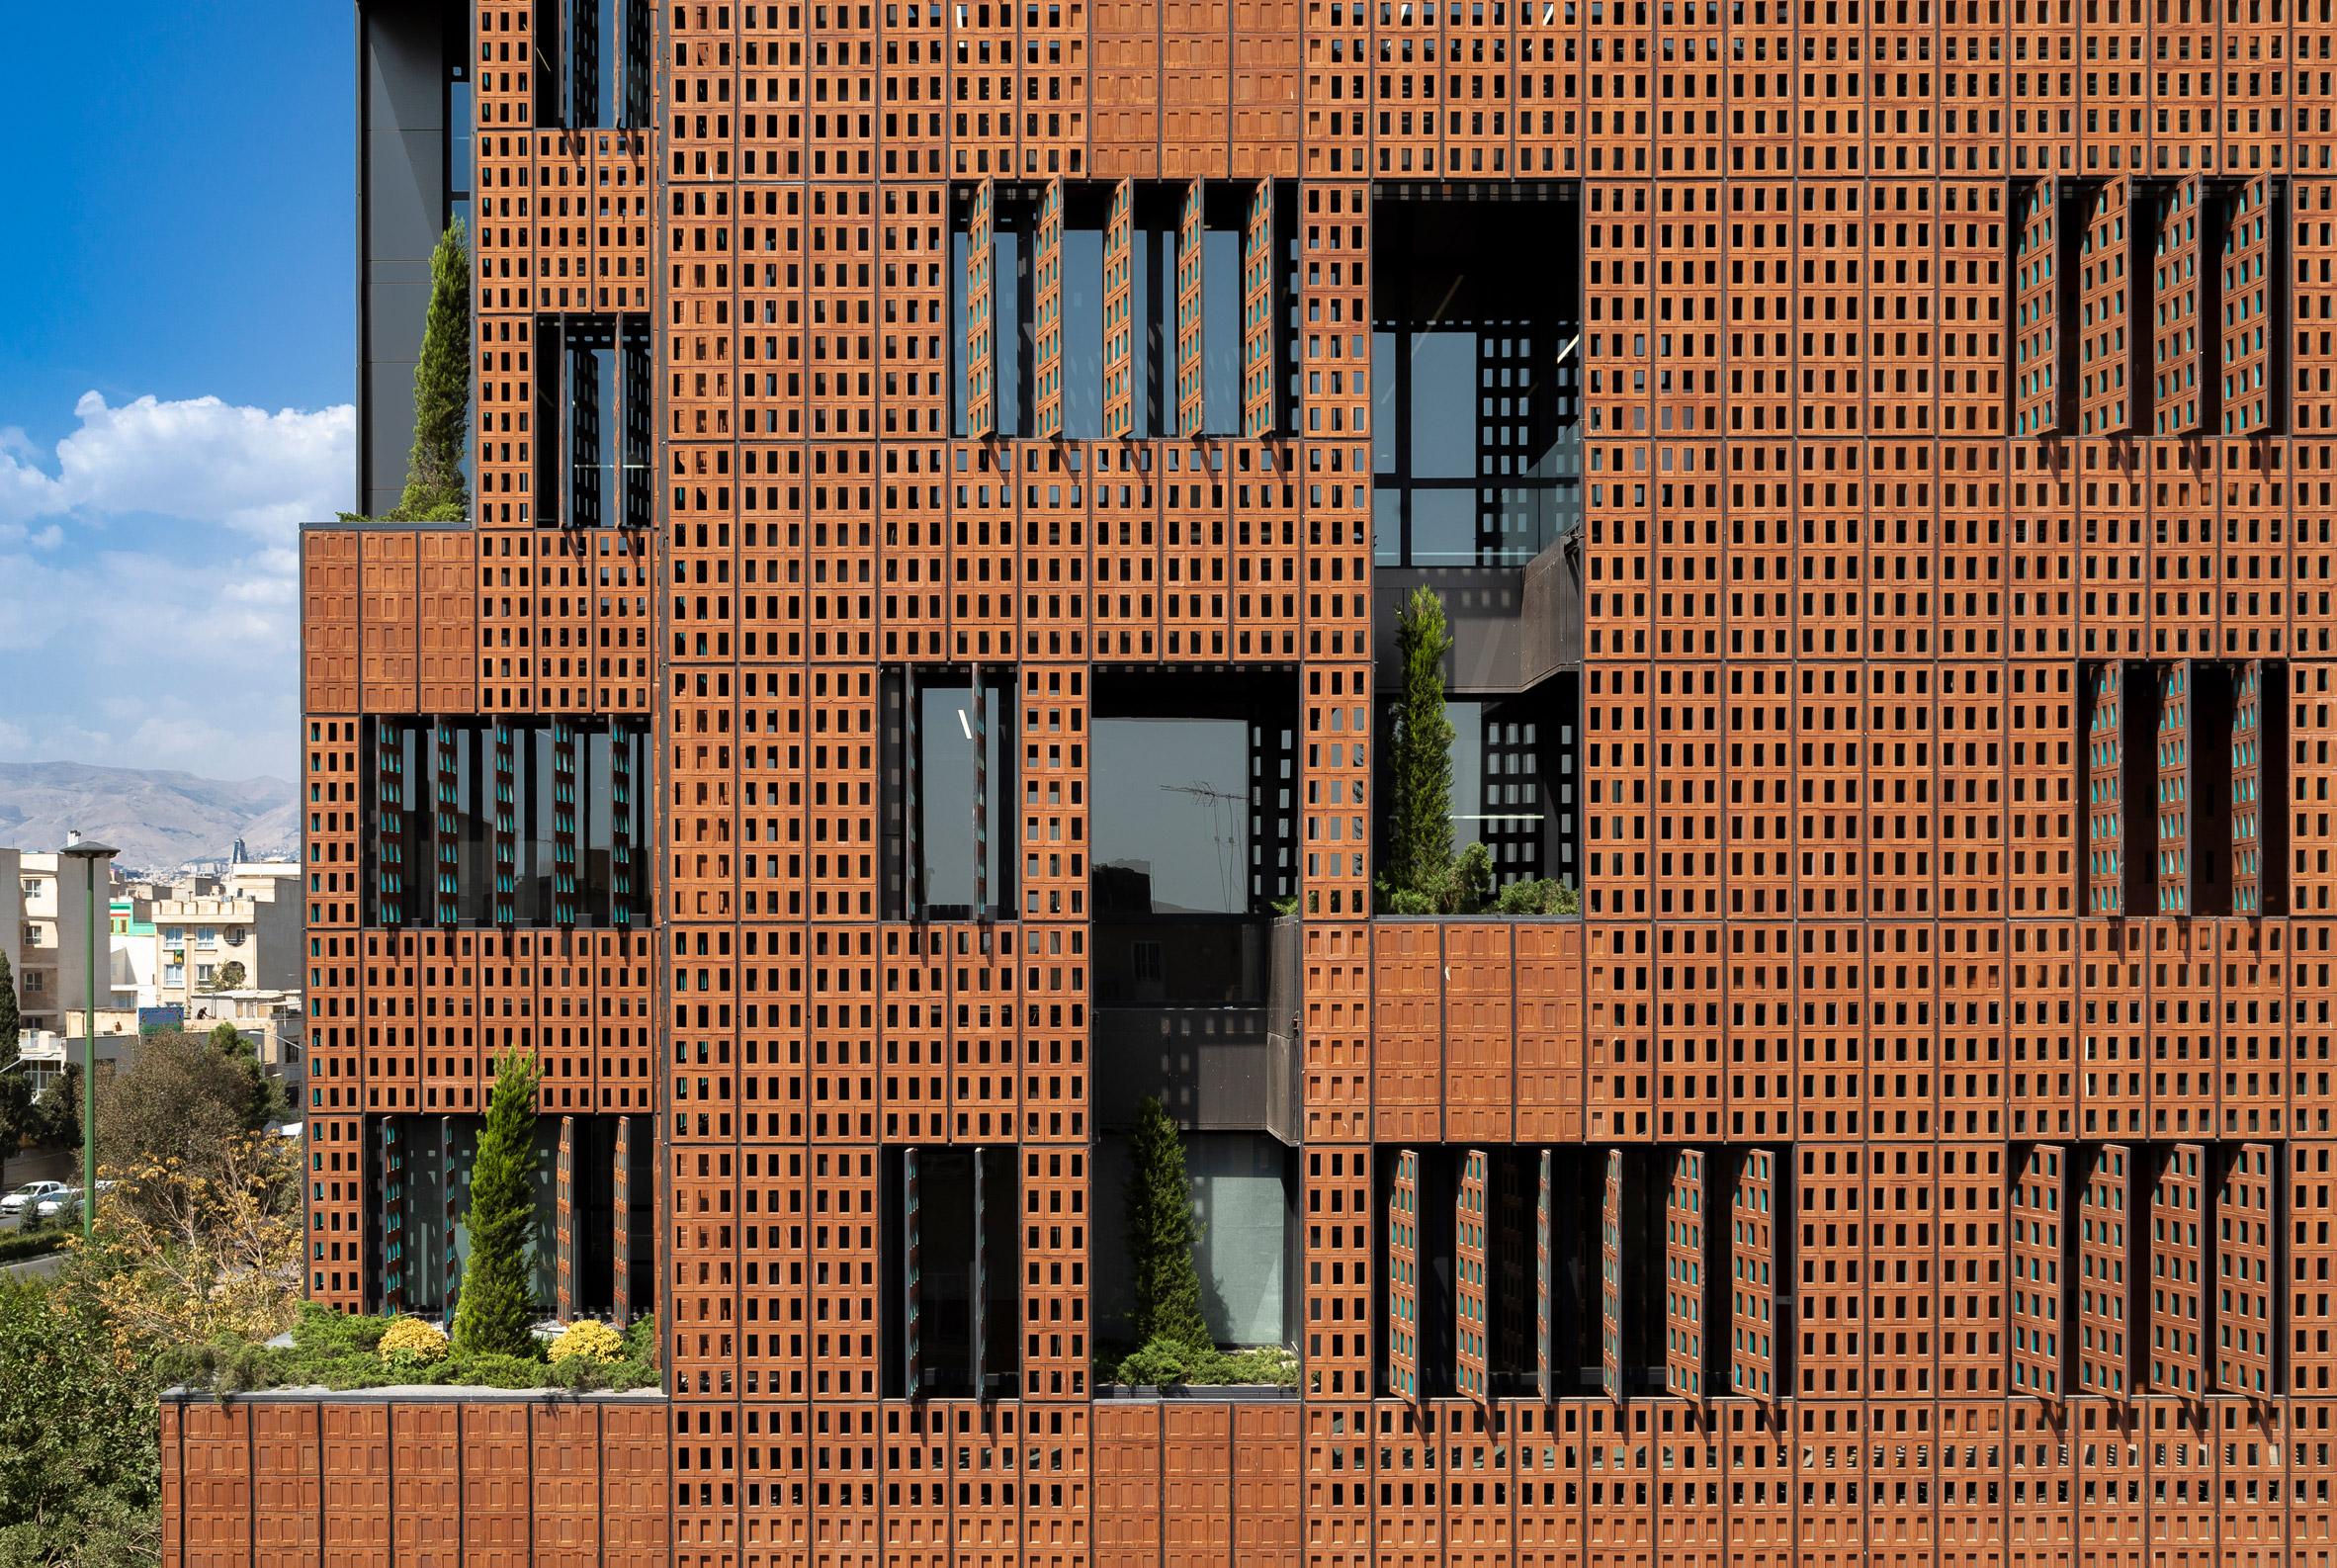 Brick facade of Sharif Office Building by Hooba Design Group